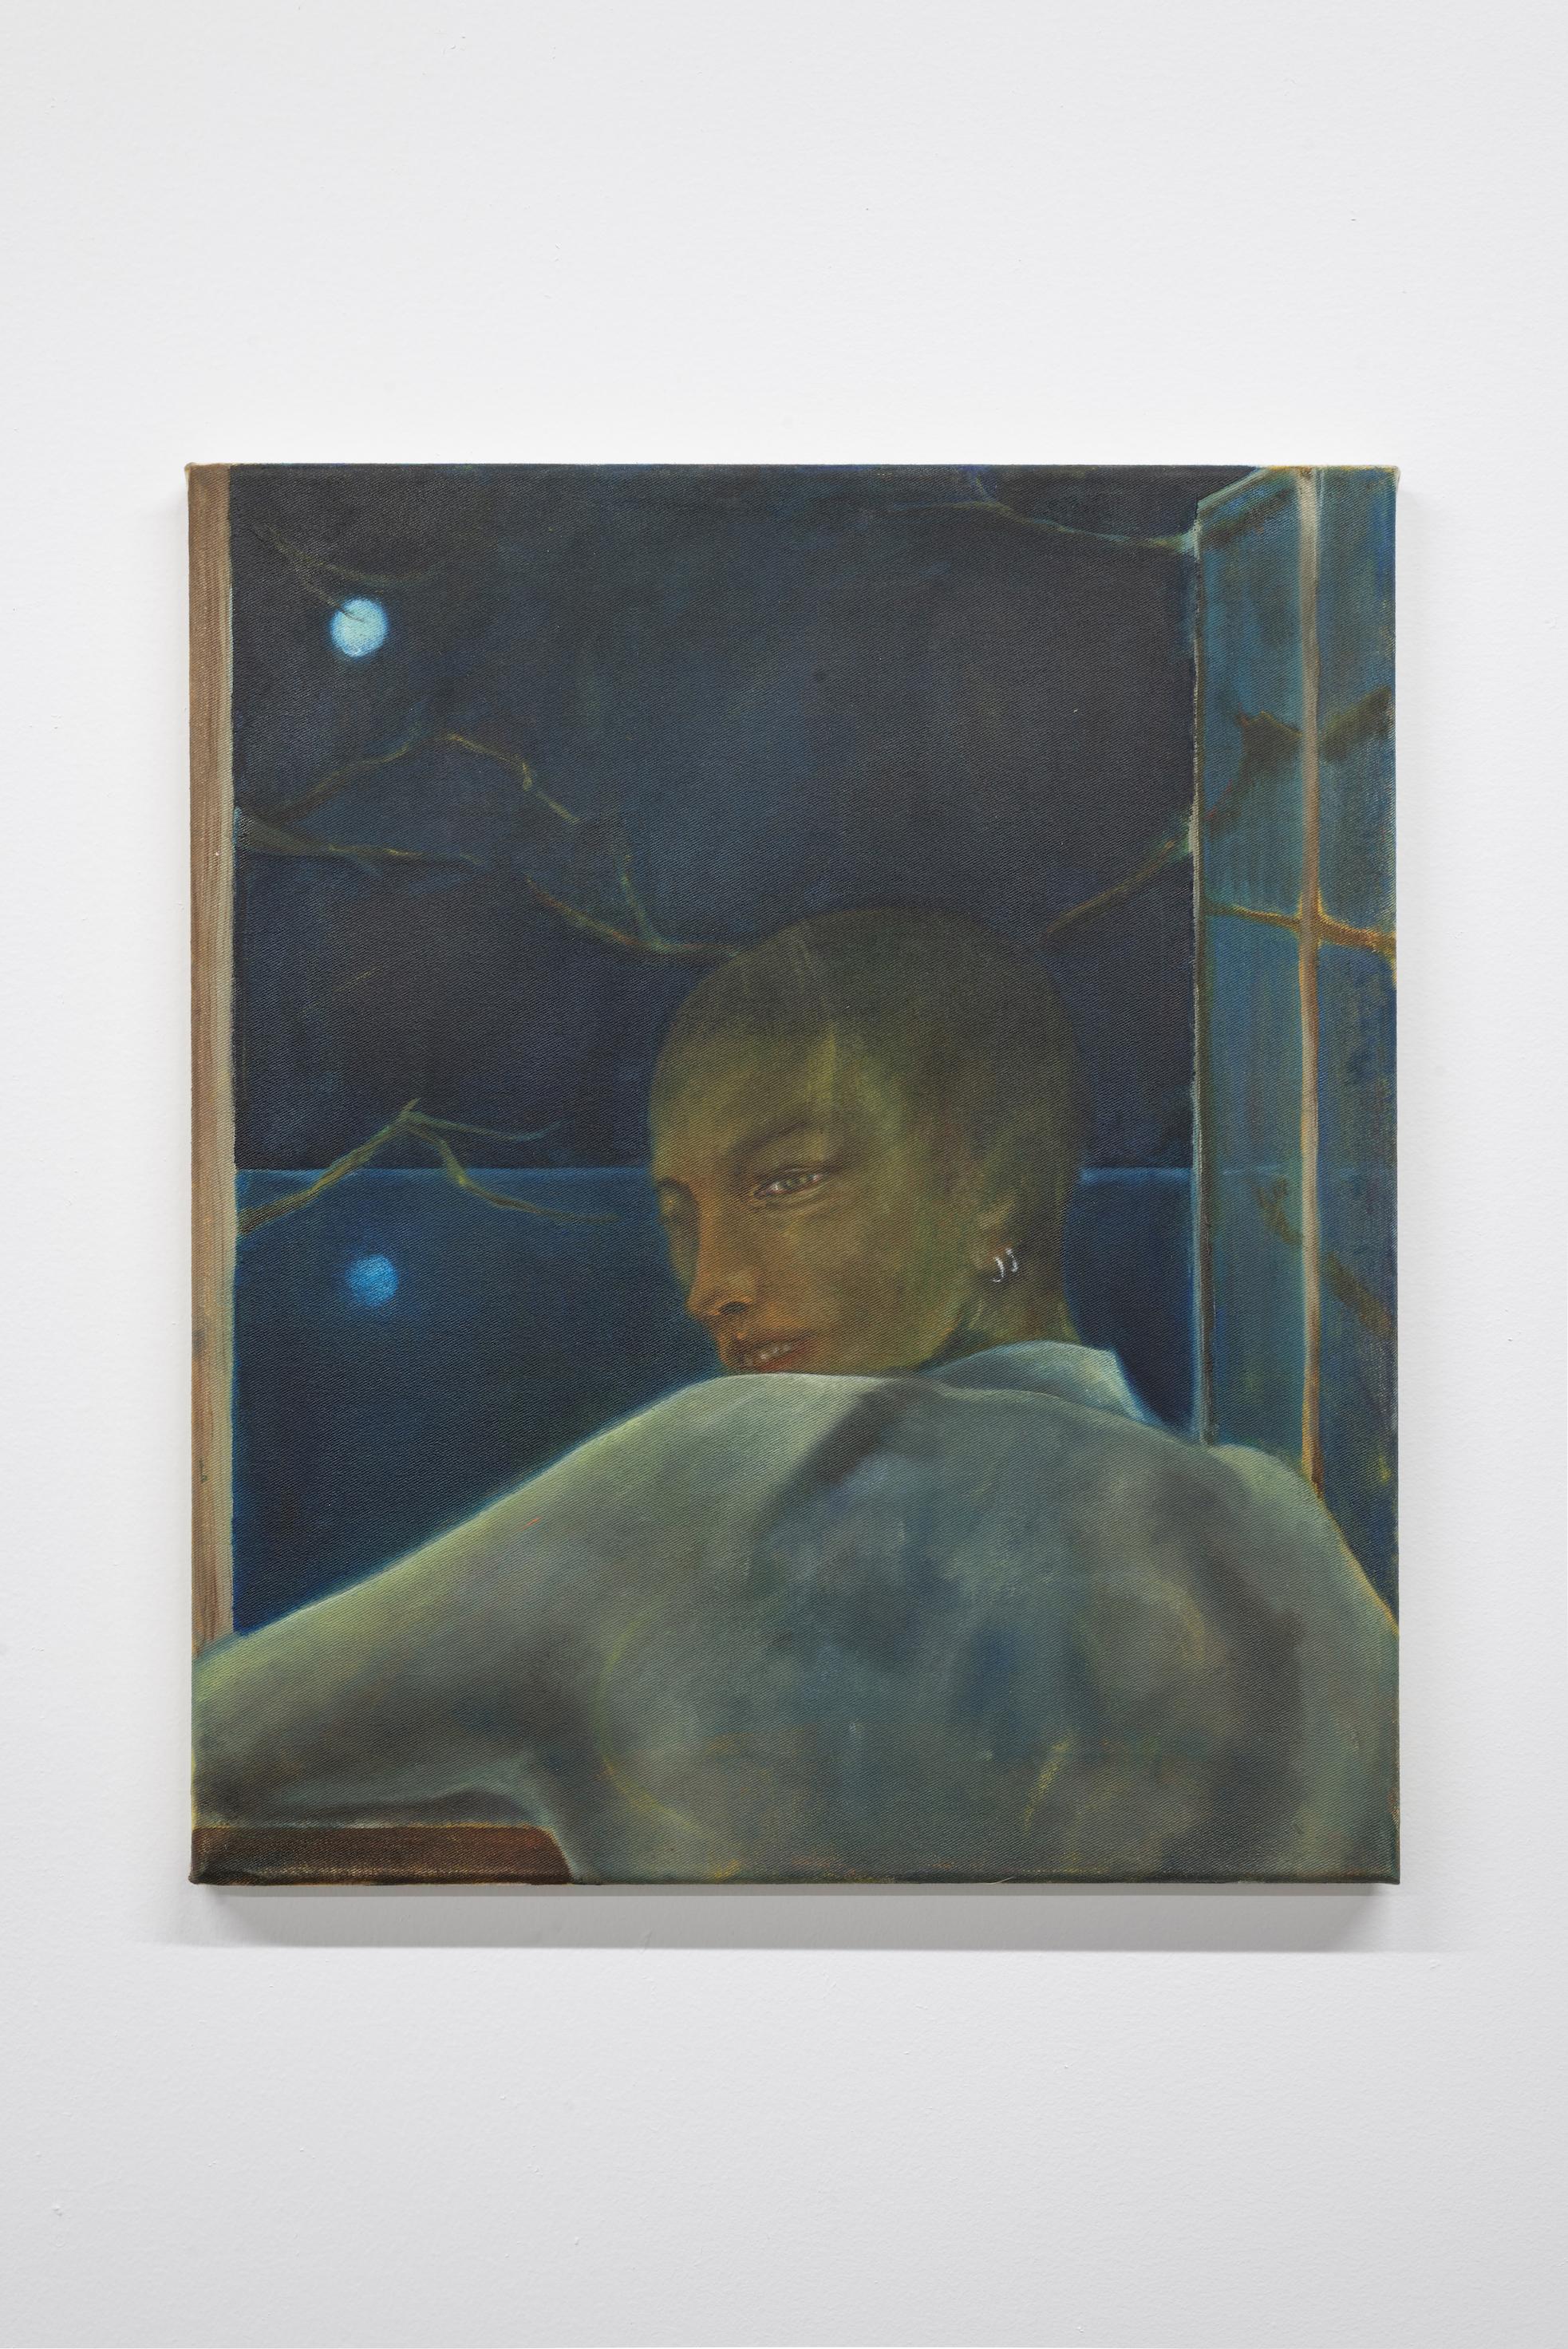 Ernst Yohji Jäger,  Untitled,  2019, Oil on canvas, 20 x 16 inches